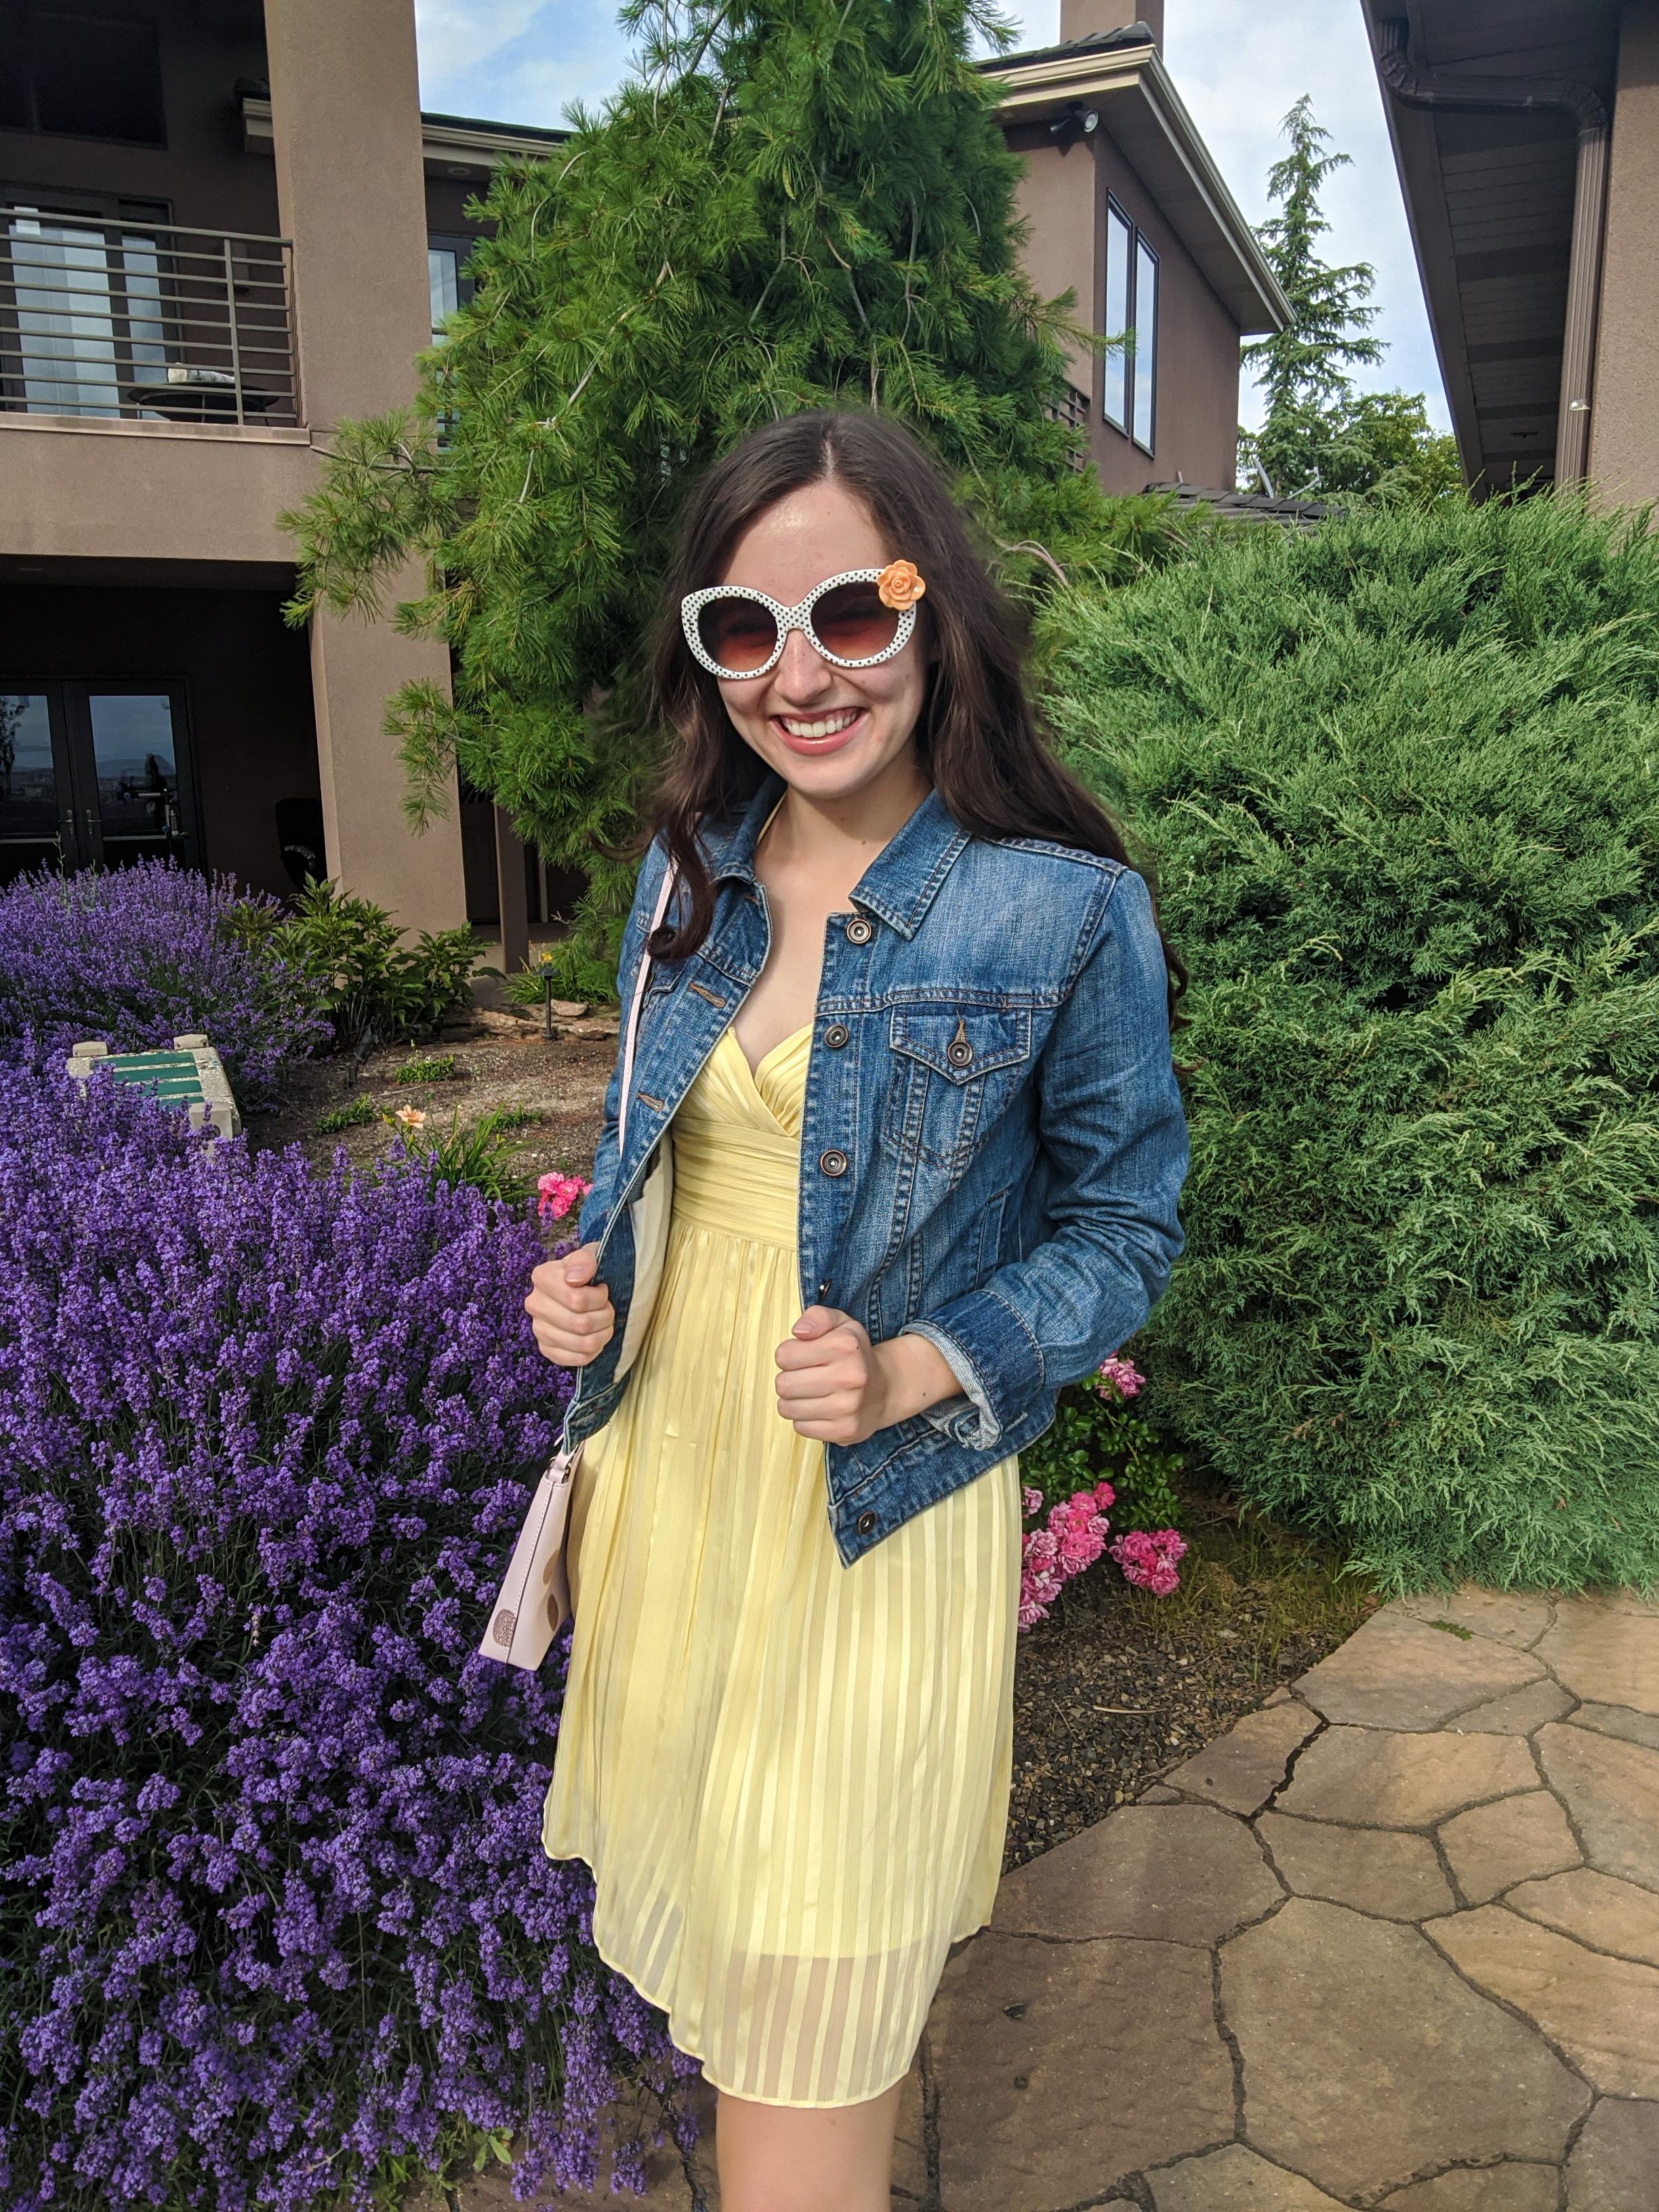 yellow-clothing-summer-dress-polkadot-sunglasses